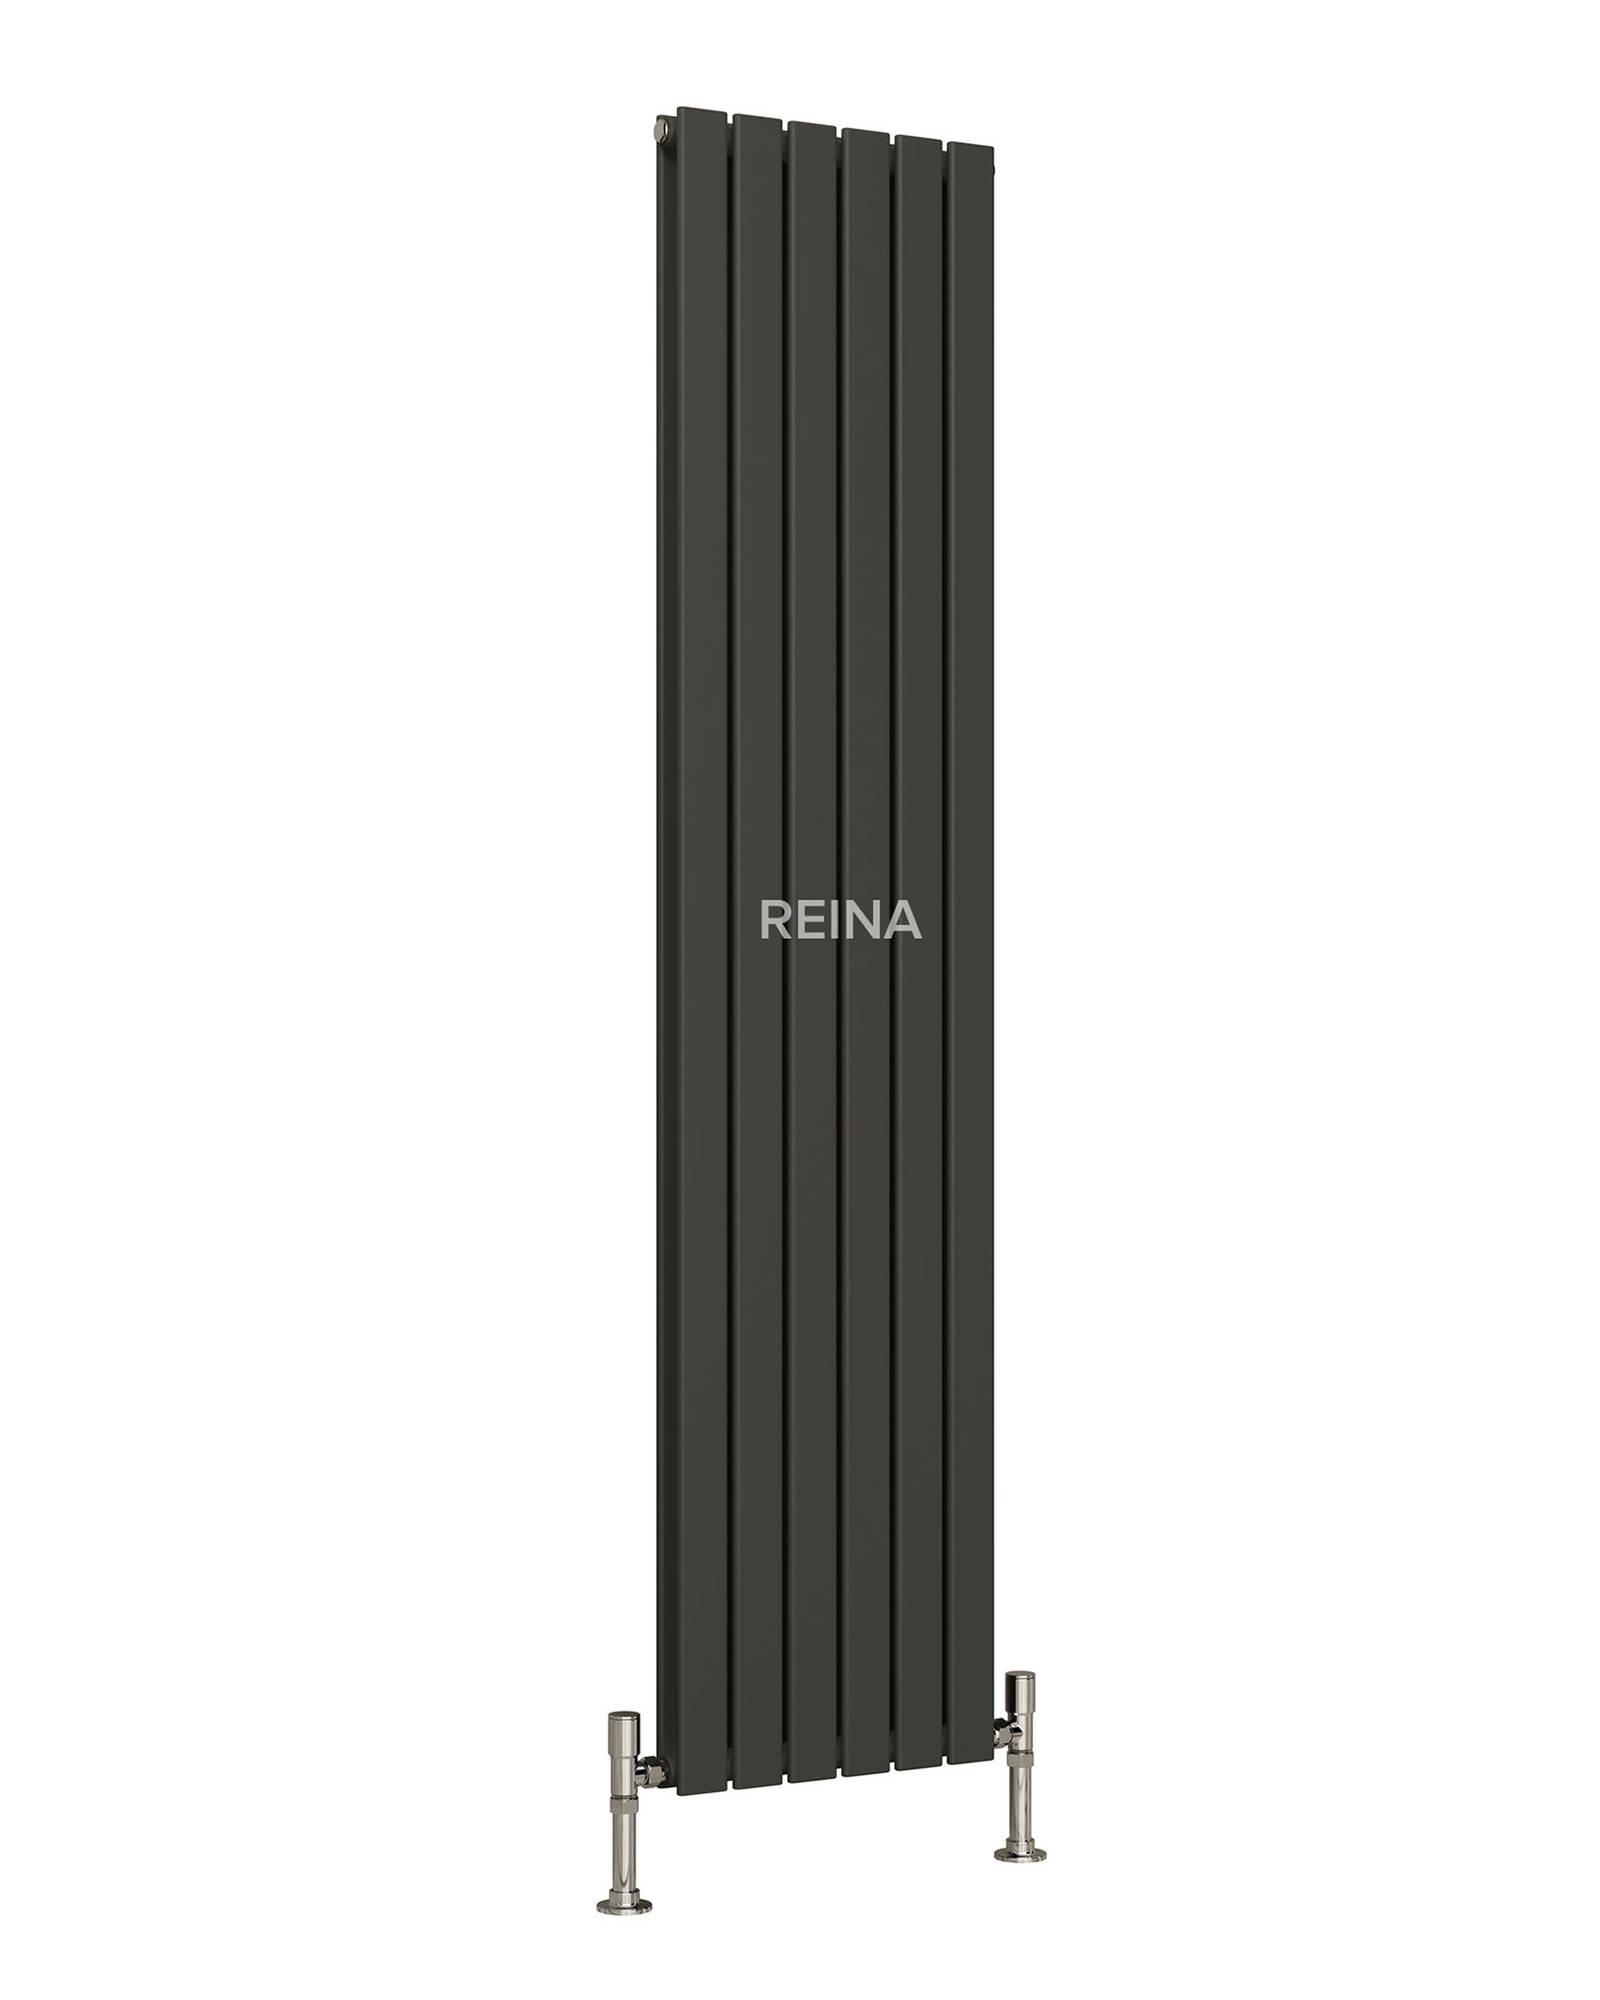 reina flat vertical double panel radiator 440 x 1800mm. Black Bedroom Furniture Sets. Home Design Ideas